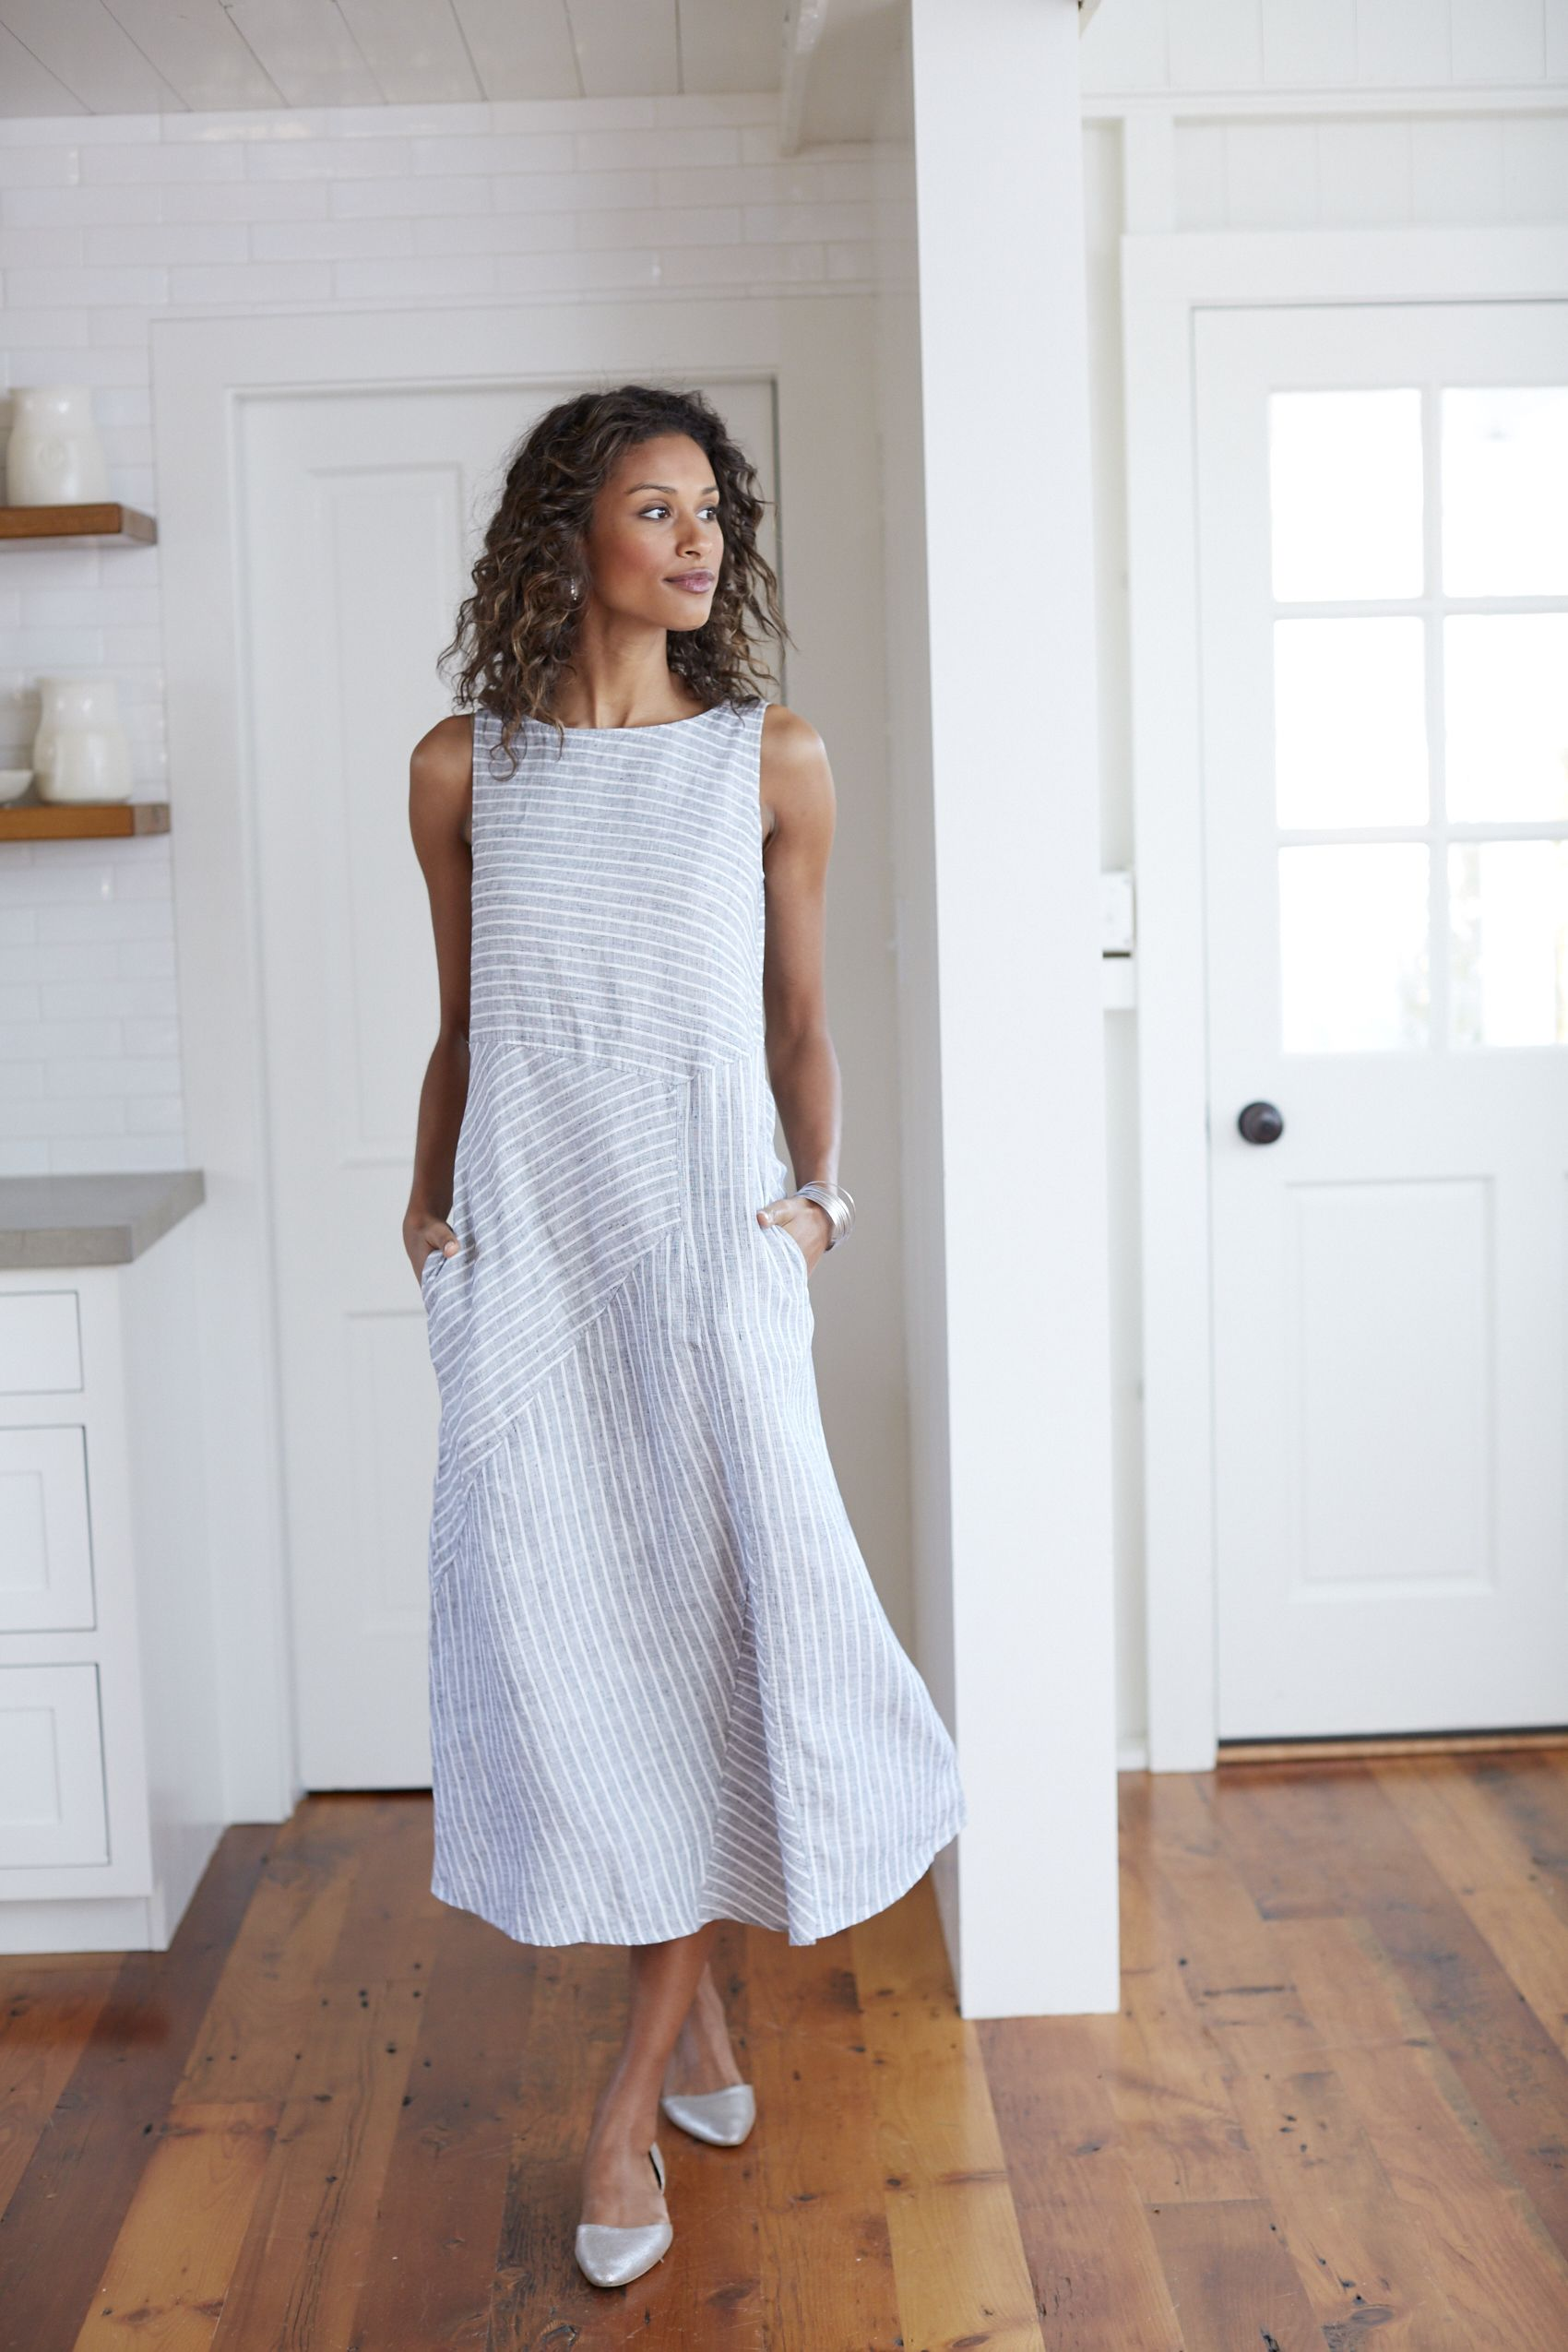 dd352a7da7981 Mixed-stripes linen dress   fashion love love   Pinterest ...